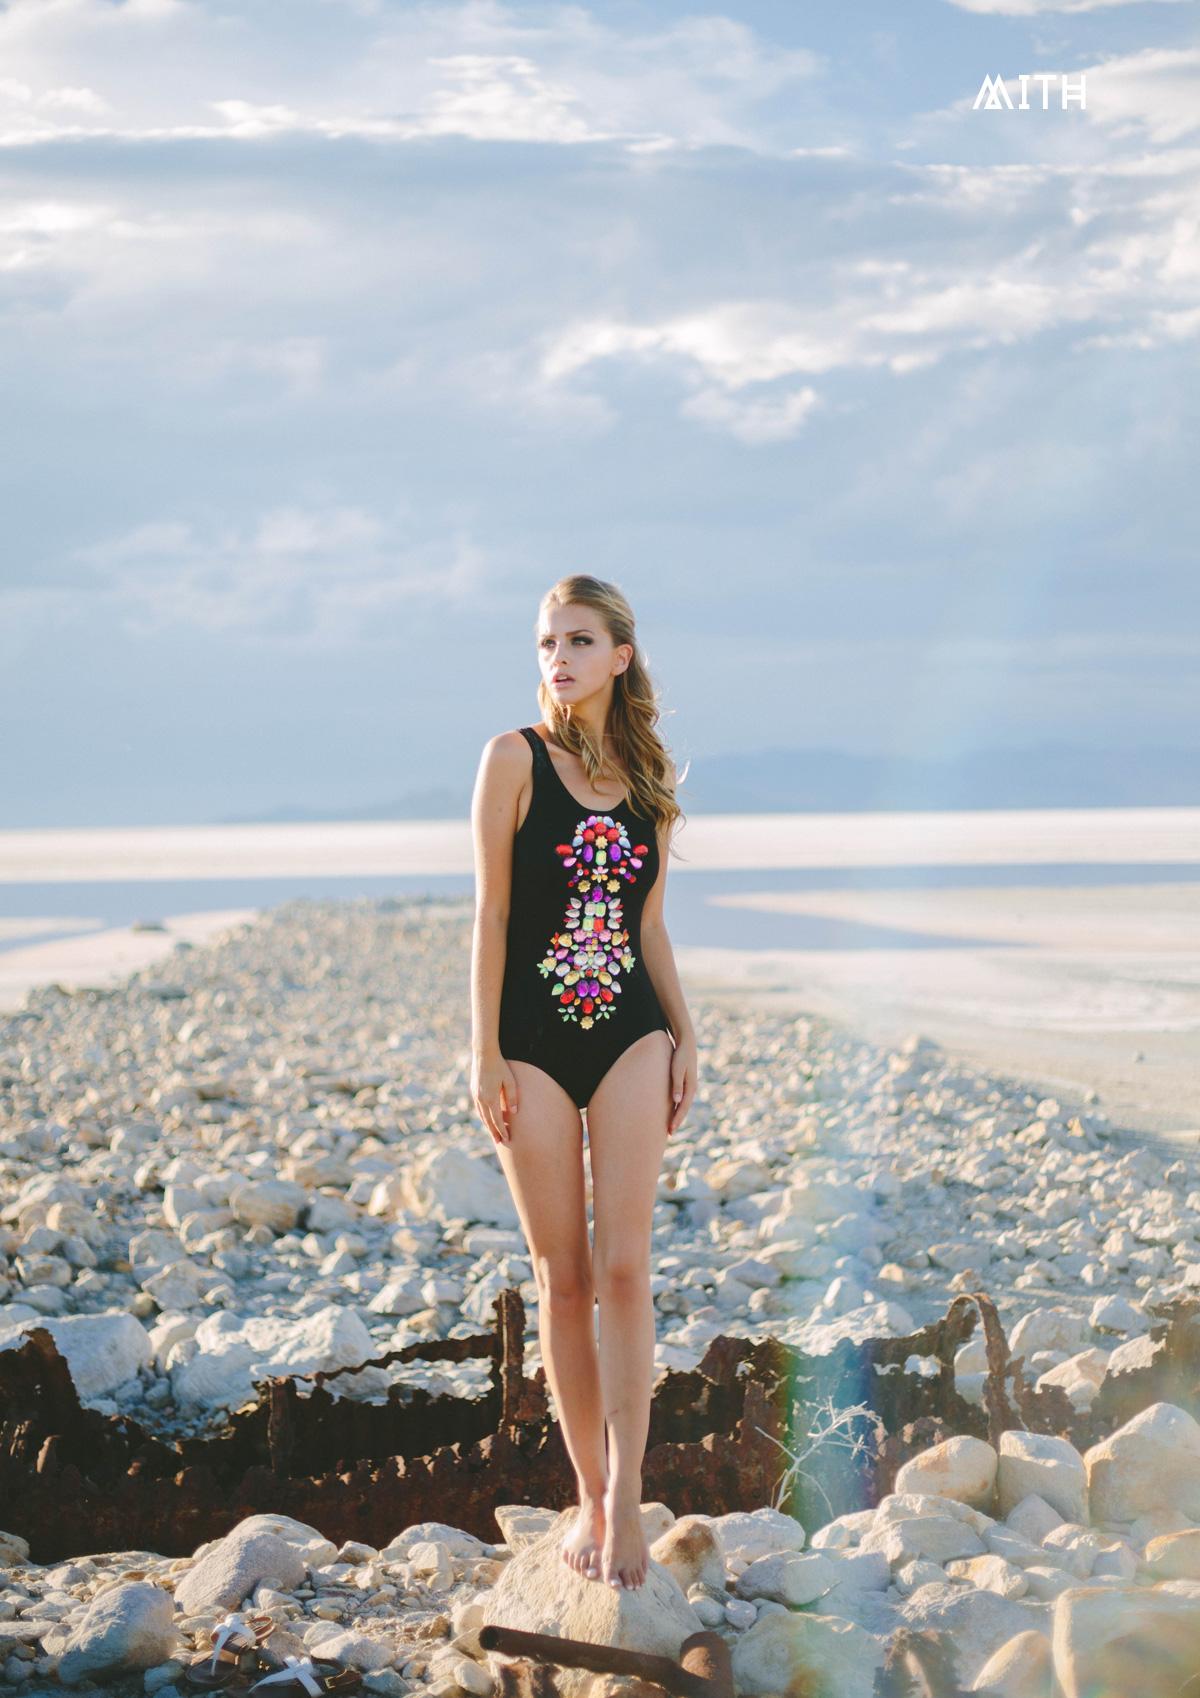 MITH_sun-soaked_marina-laswick_morgan-nielson_web40